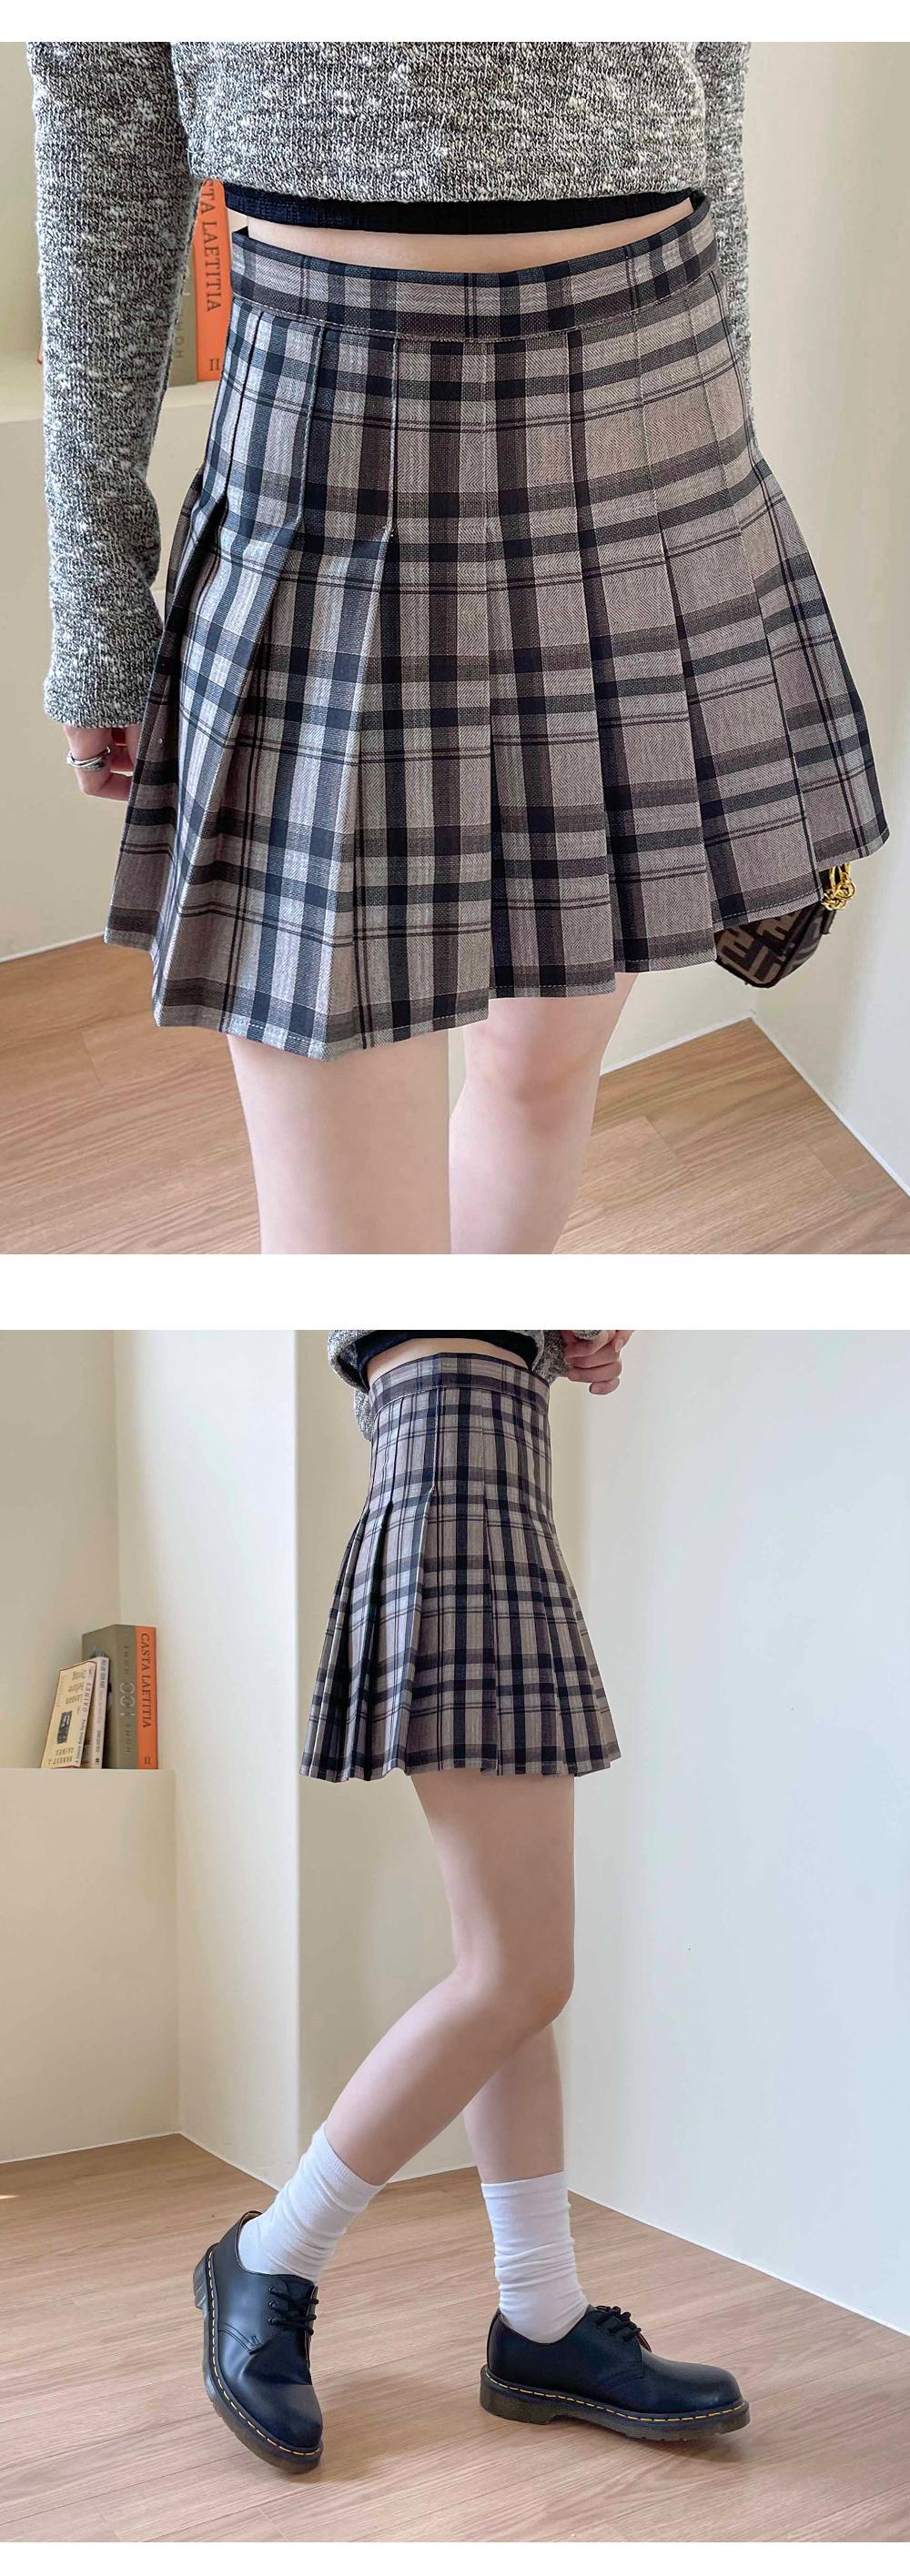 Merck check pleated mini skirt